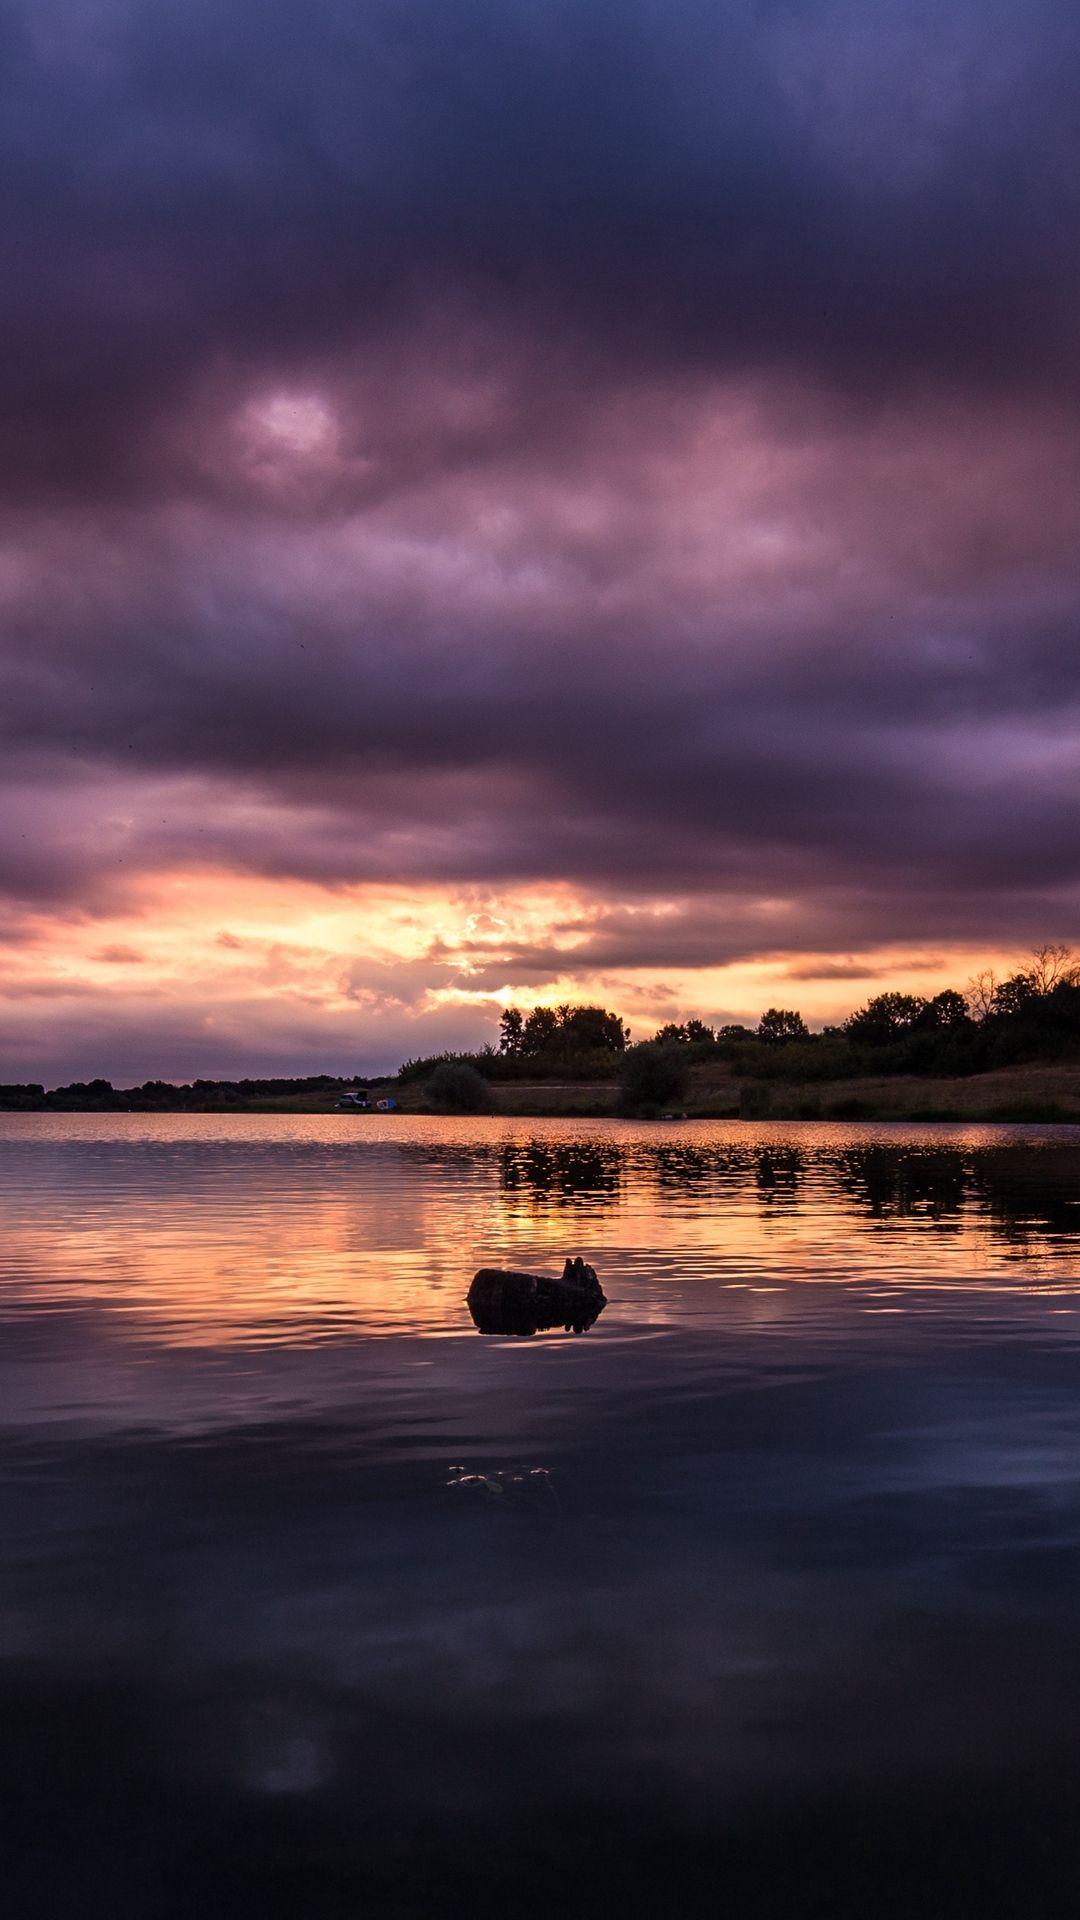 River Sunset 2560 X 1440